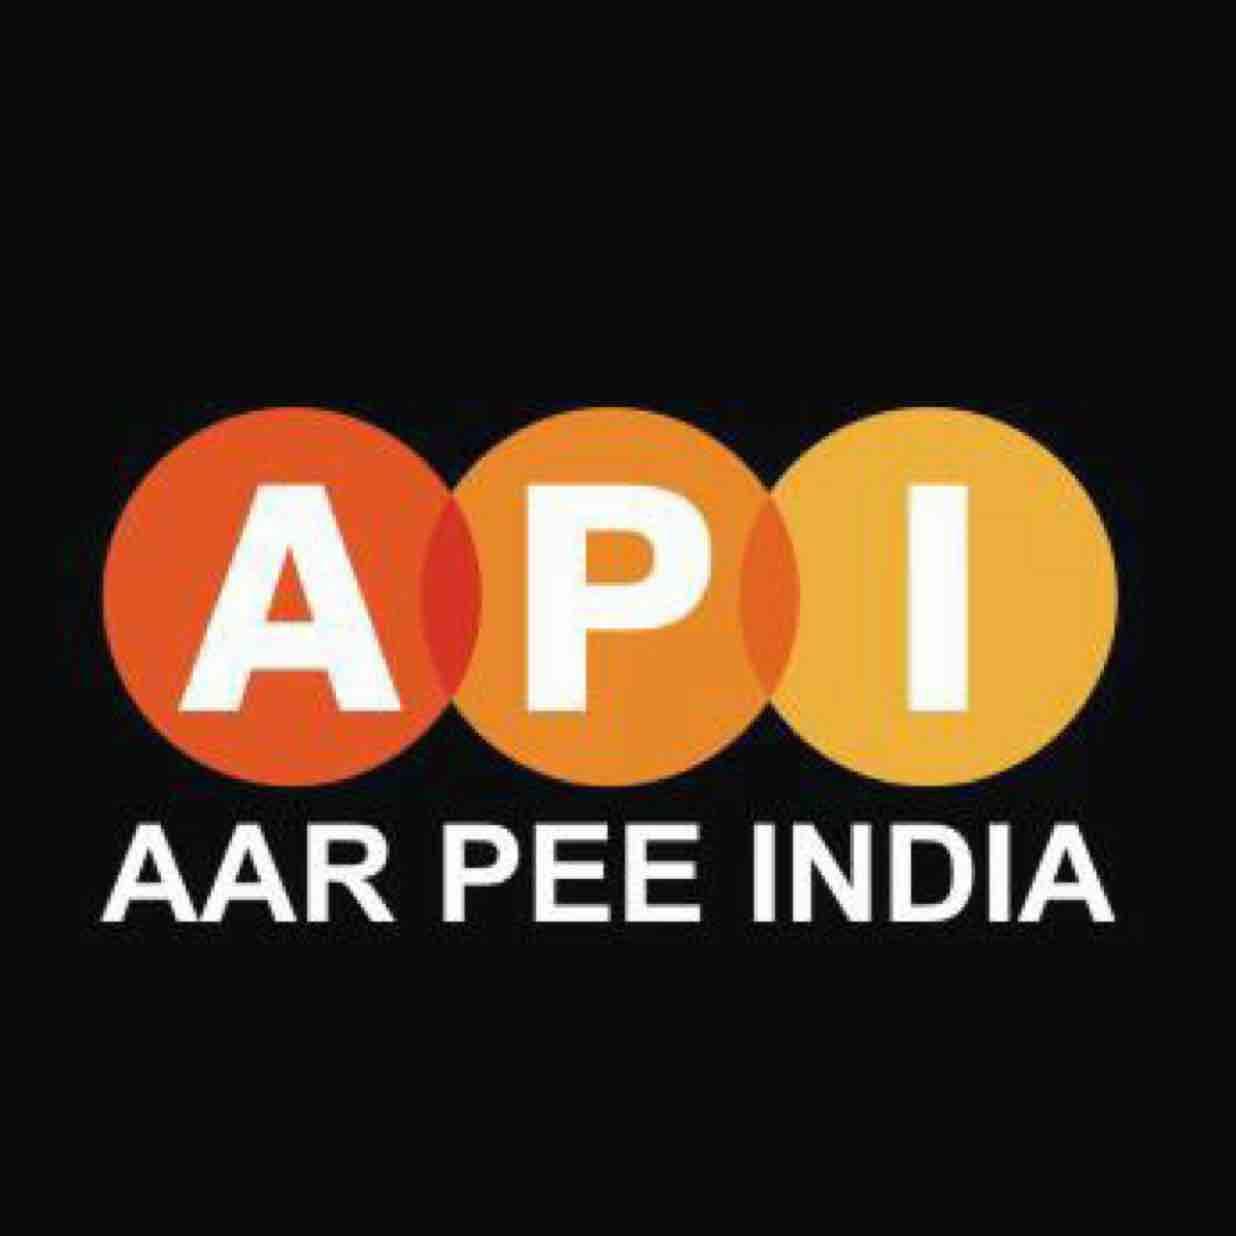 Aar Pee India | Boarcode Label Manufacturers In Delhi | Barcode Printer | Barcode Ribbon Manufacturers In Delhi | Barcode Scanner